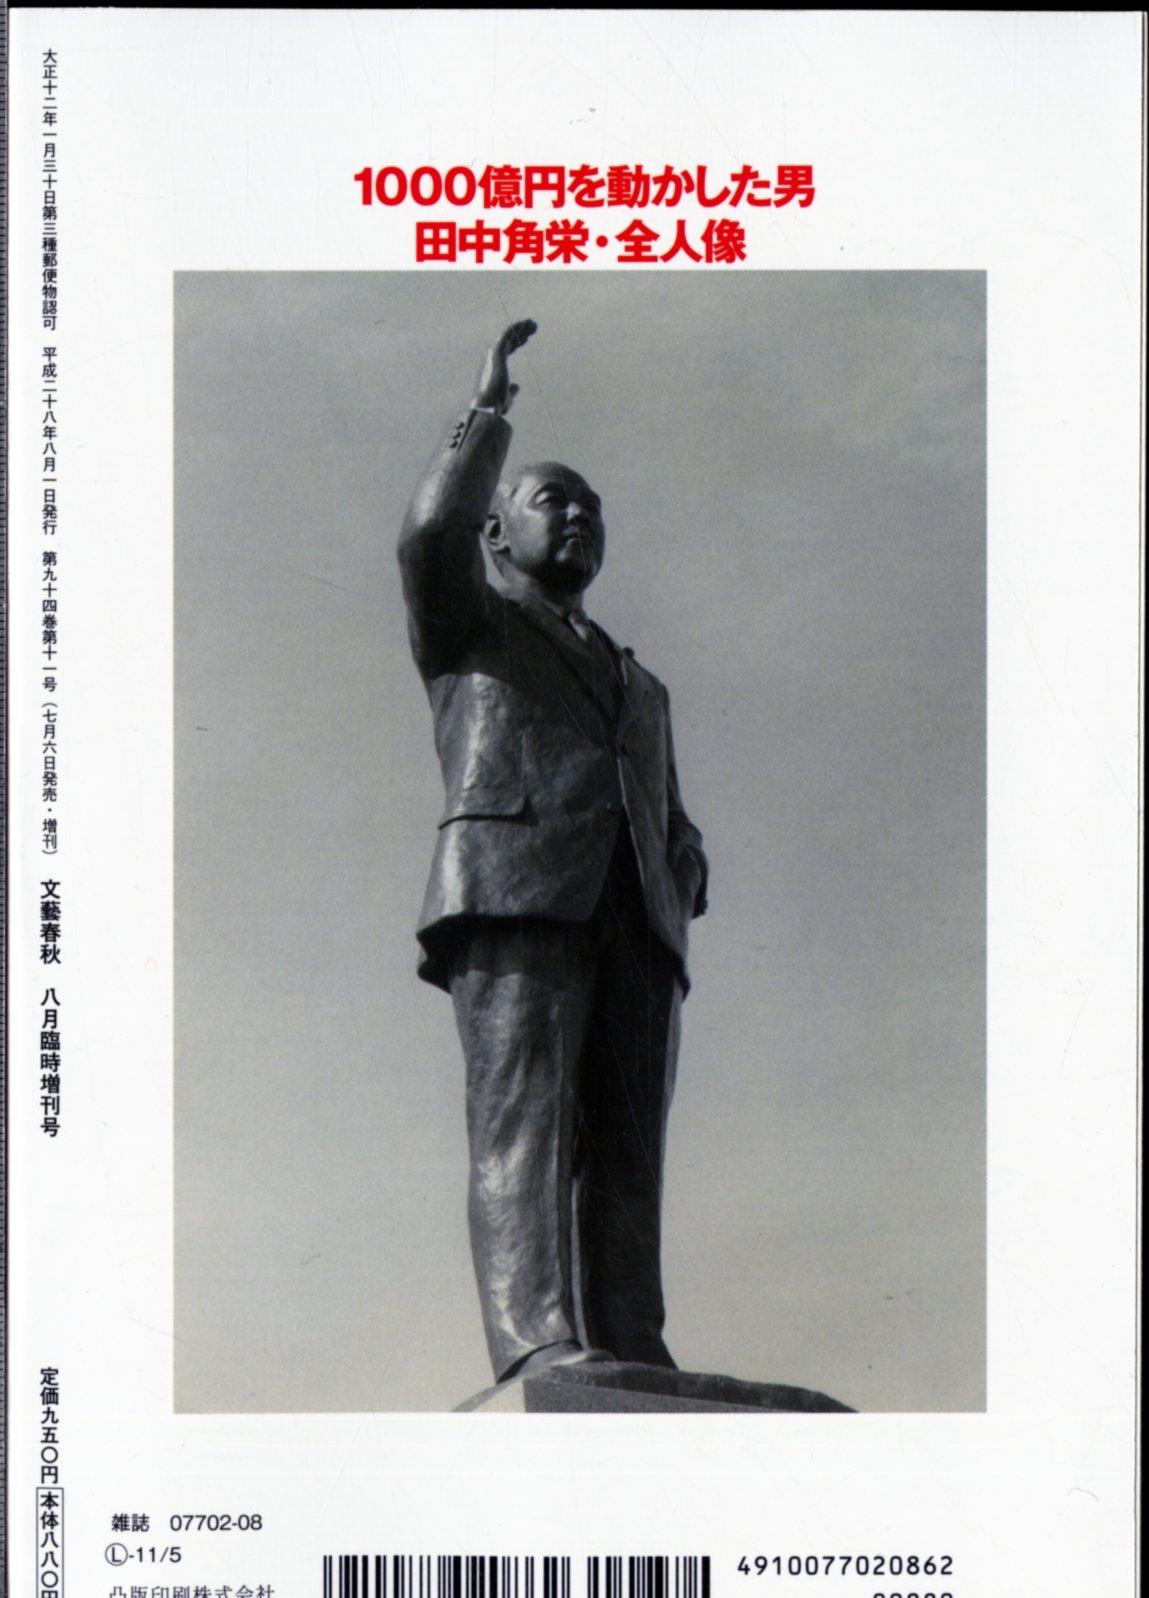 https://m.media-amazon.com/images/I/71VFGSWcNRL.jpg